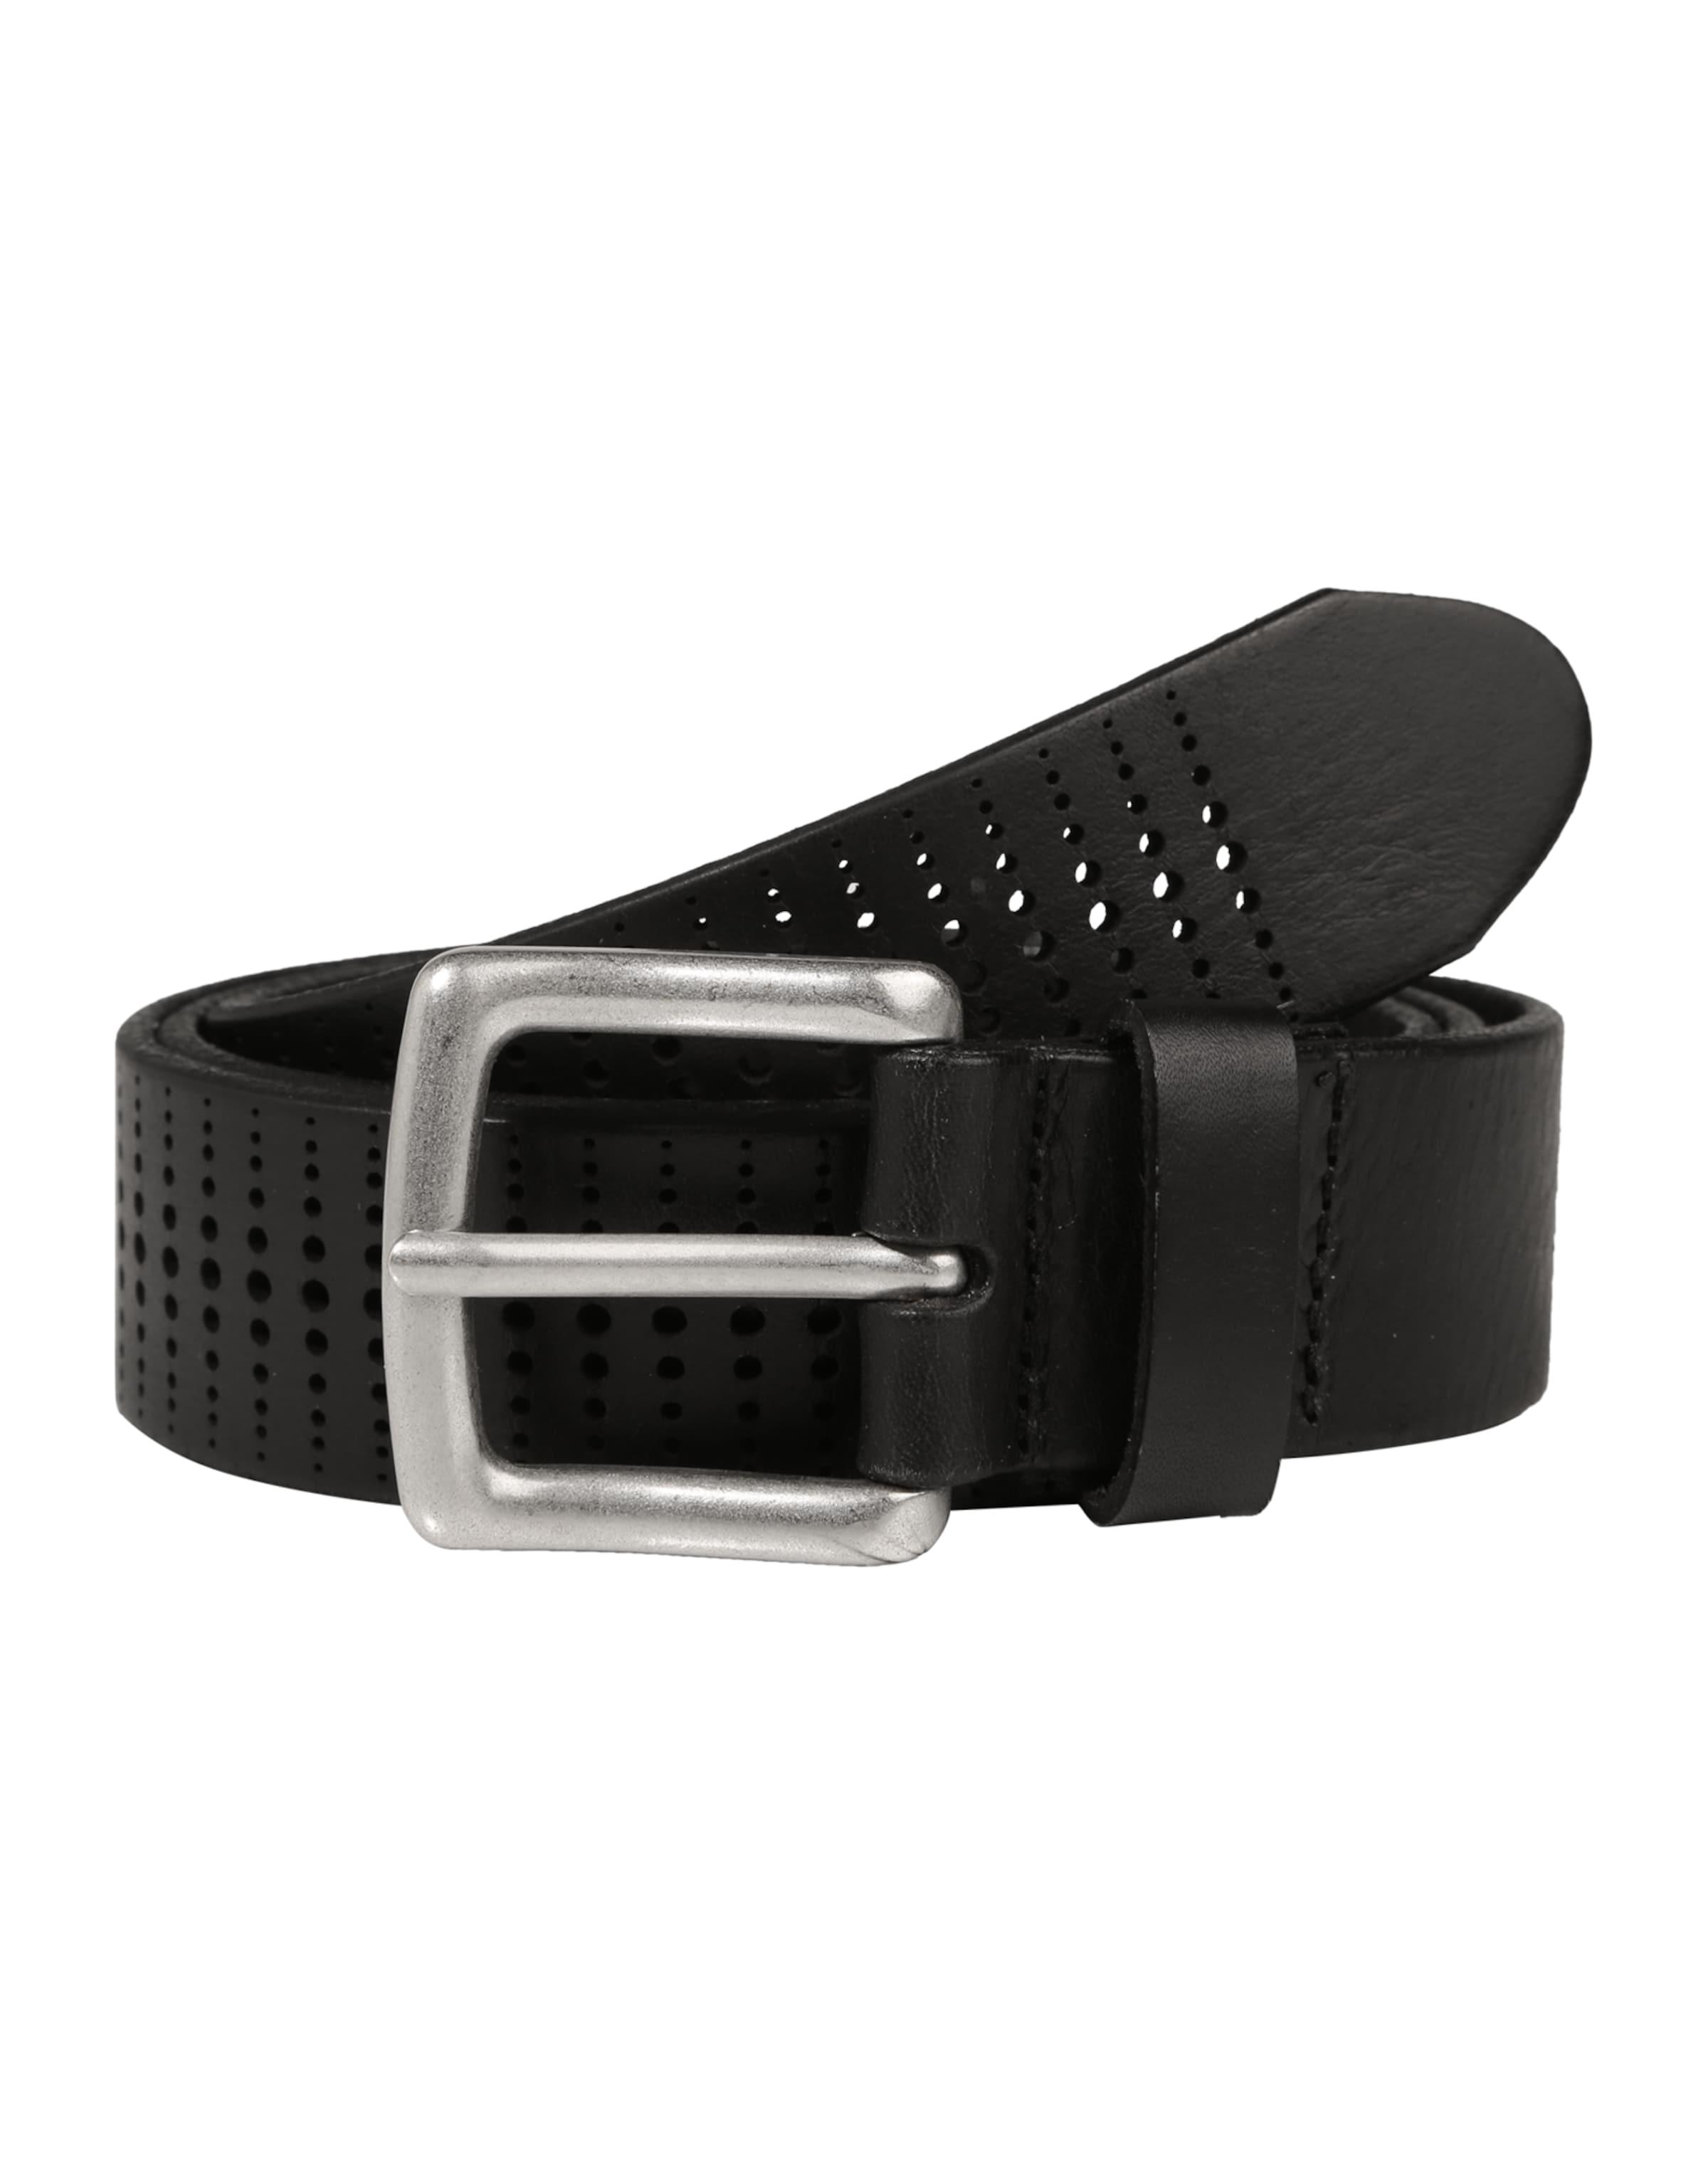 100% Authentisch Zu Verkaufen Günstig Kaufen Marc O'Polo Perforierter Ledergürtel 'B06' Rabatt Mode-Stil XLkygRhh